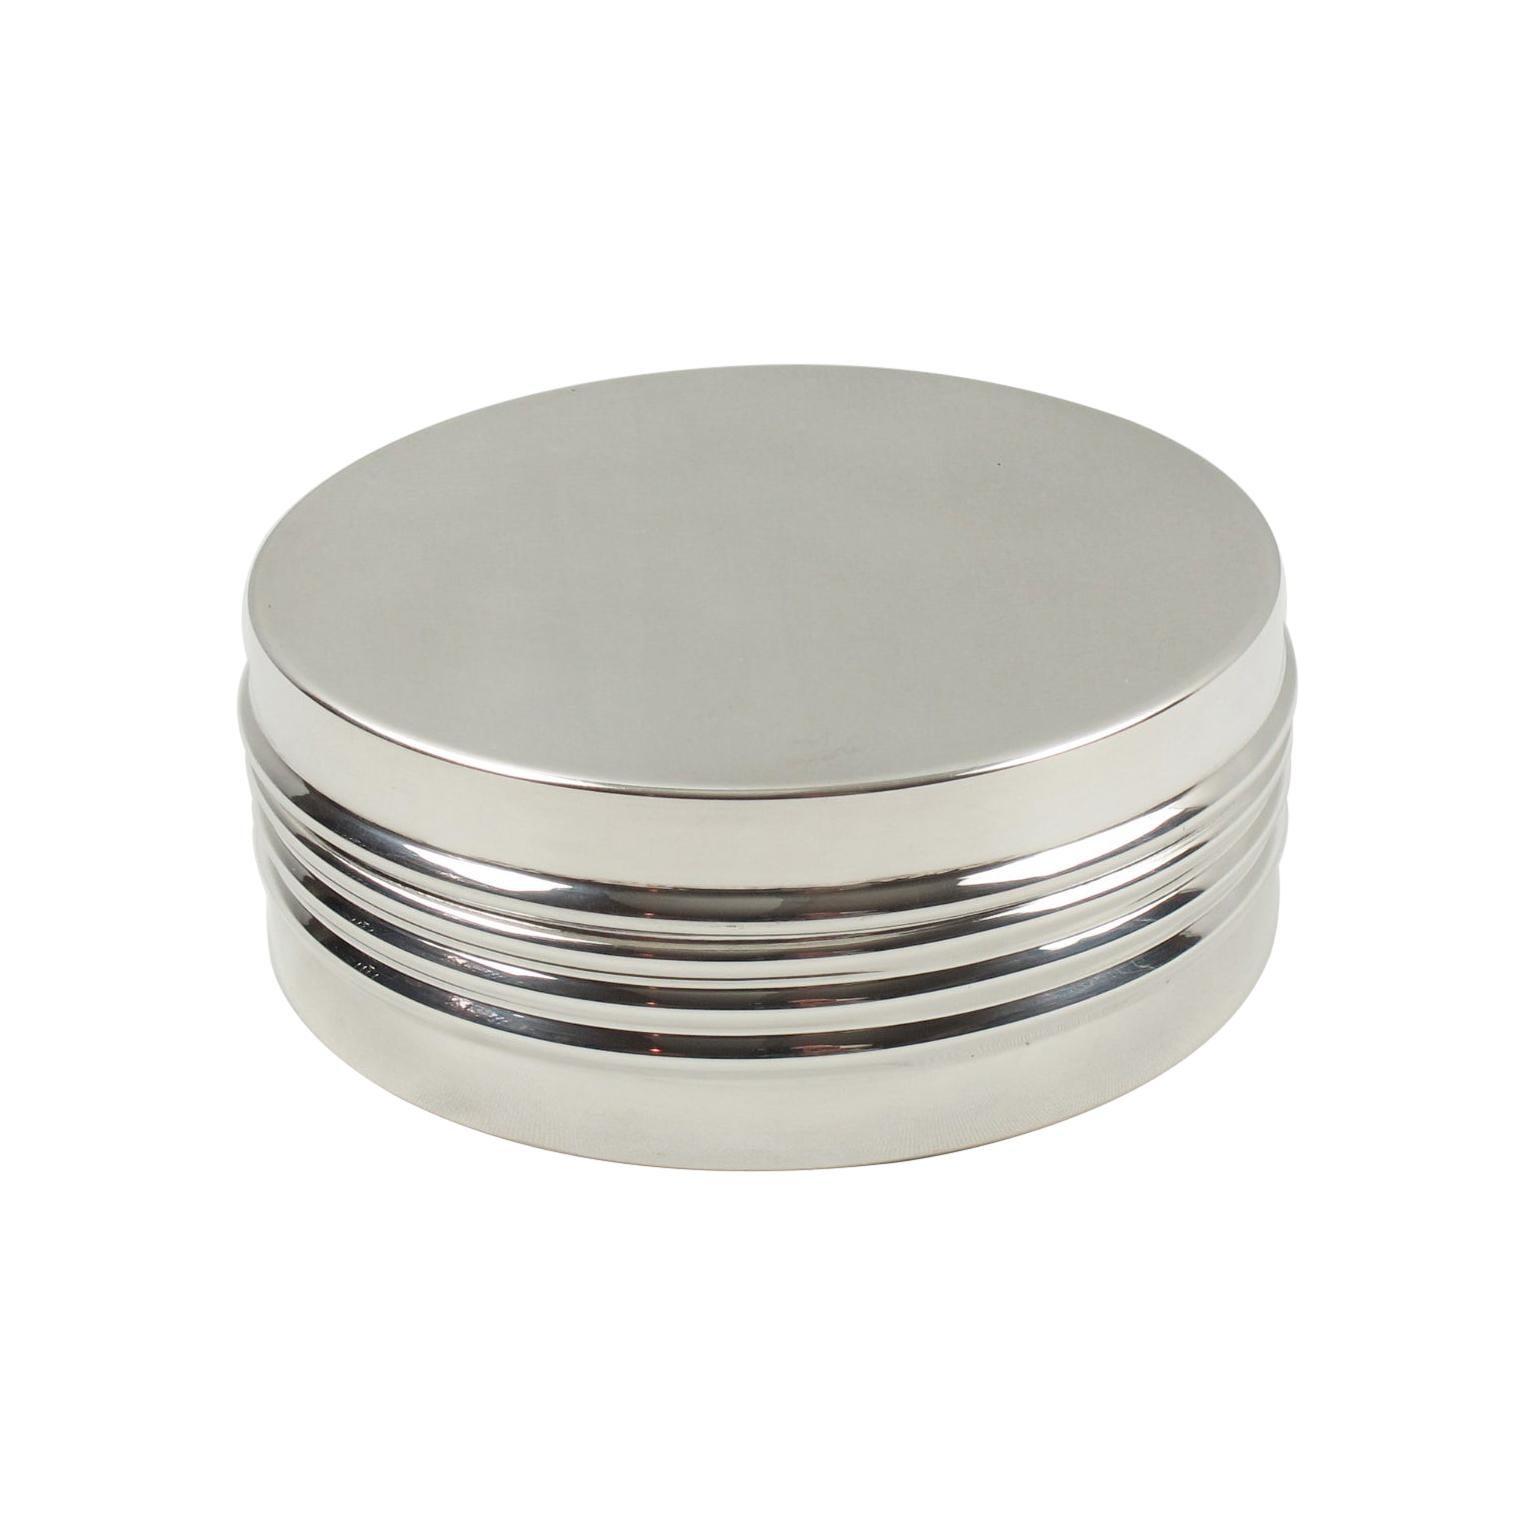 Christian Dior 1970s Silver Plate Box